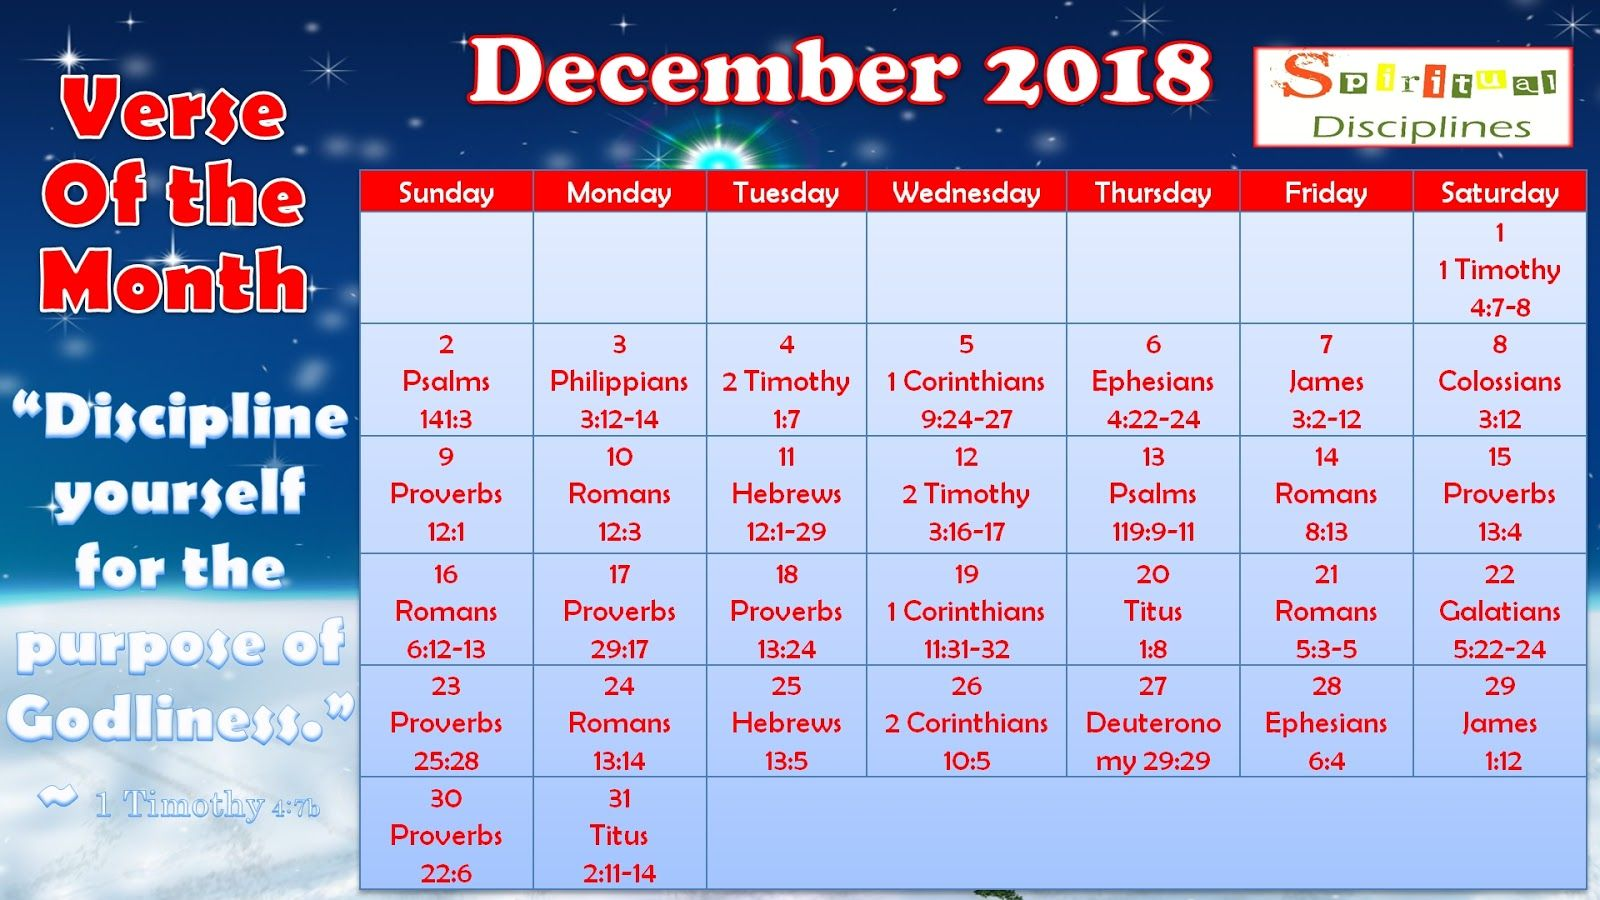 Godly Woman Daily Calendar December 2018 Printable Version